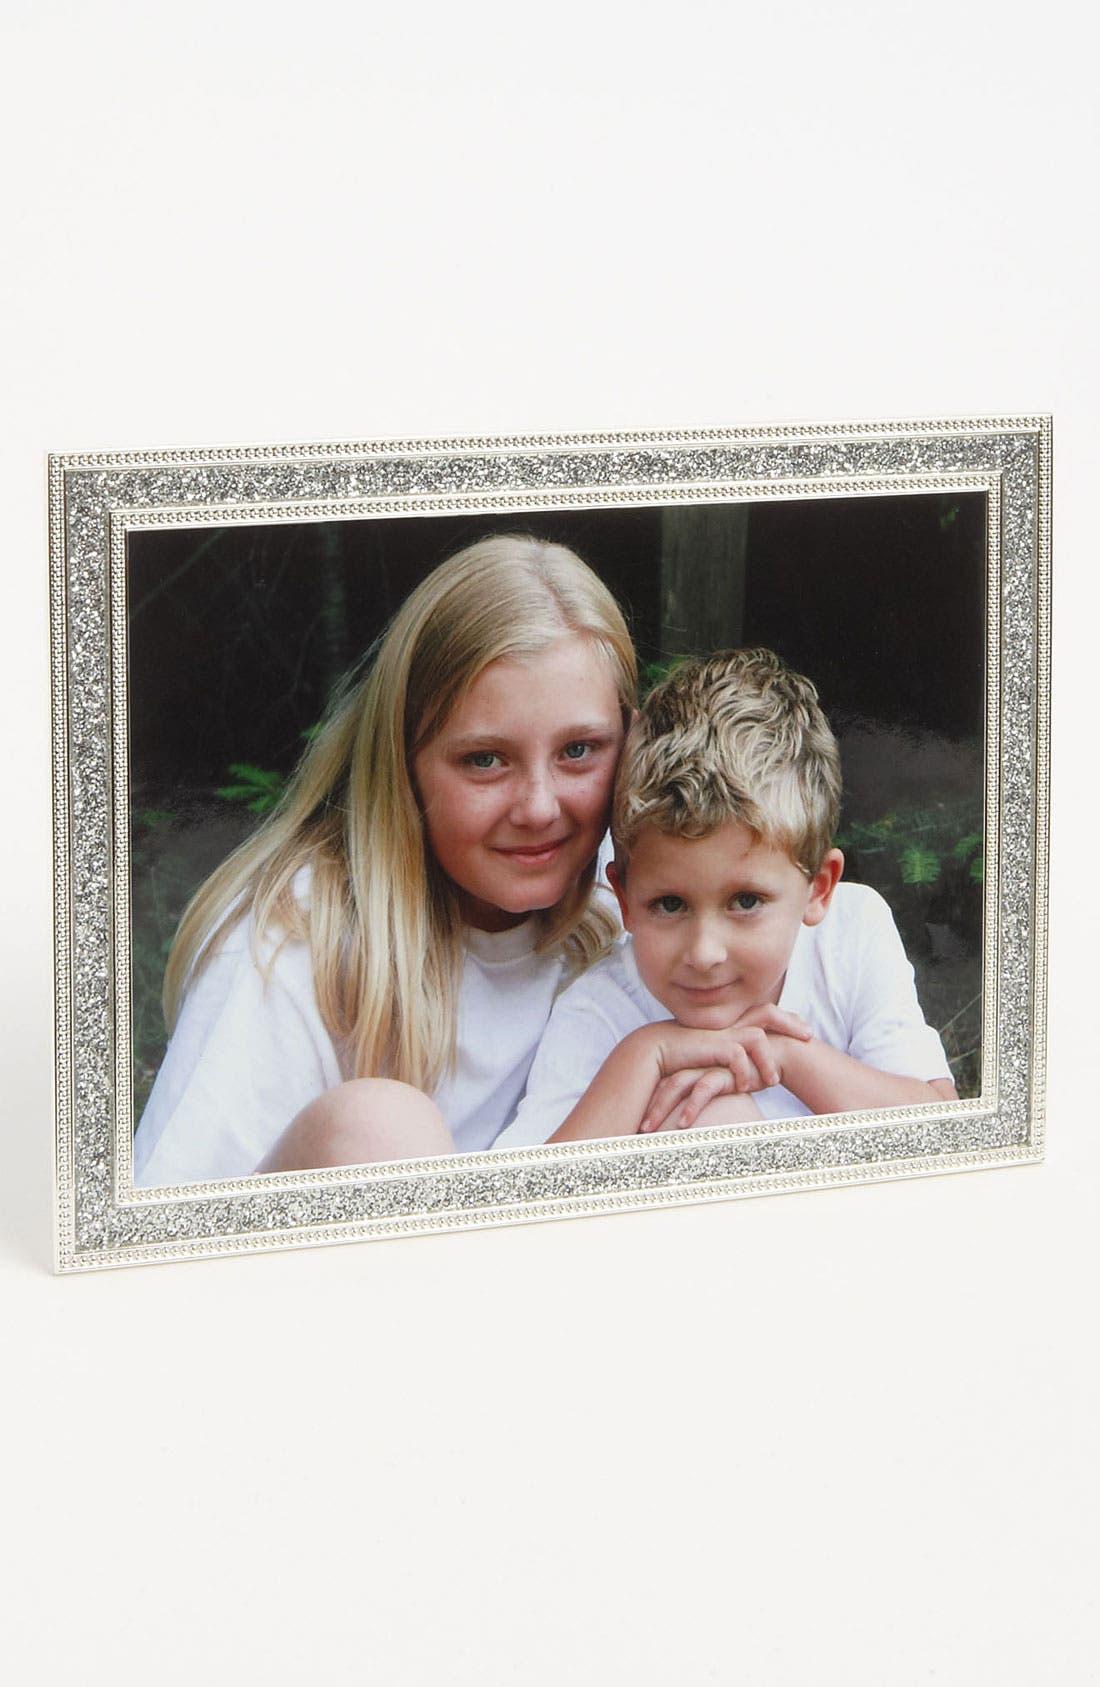 Alternate Image 1 Selected - Glitter & Rhinestone Picture Frame (5x7)